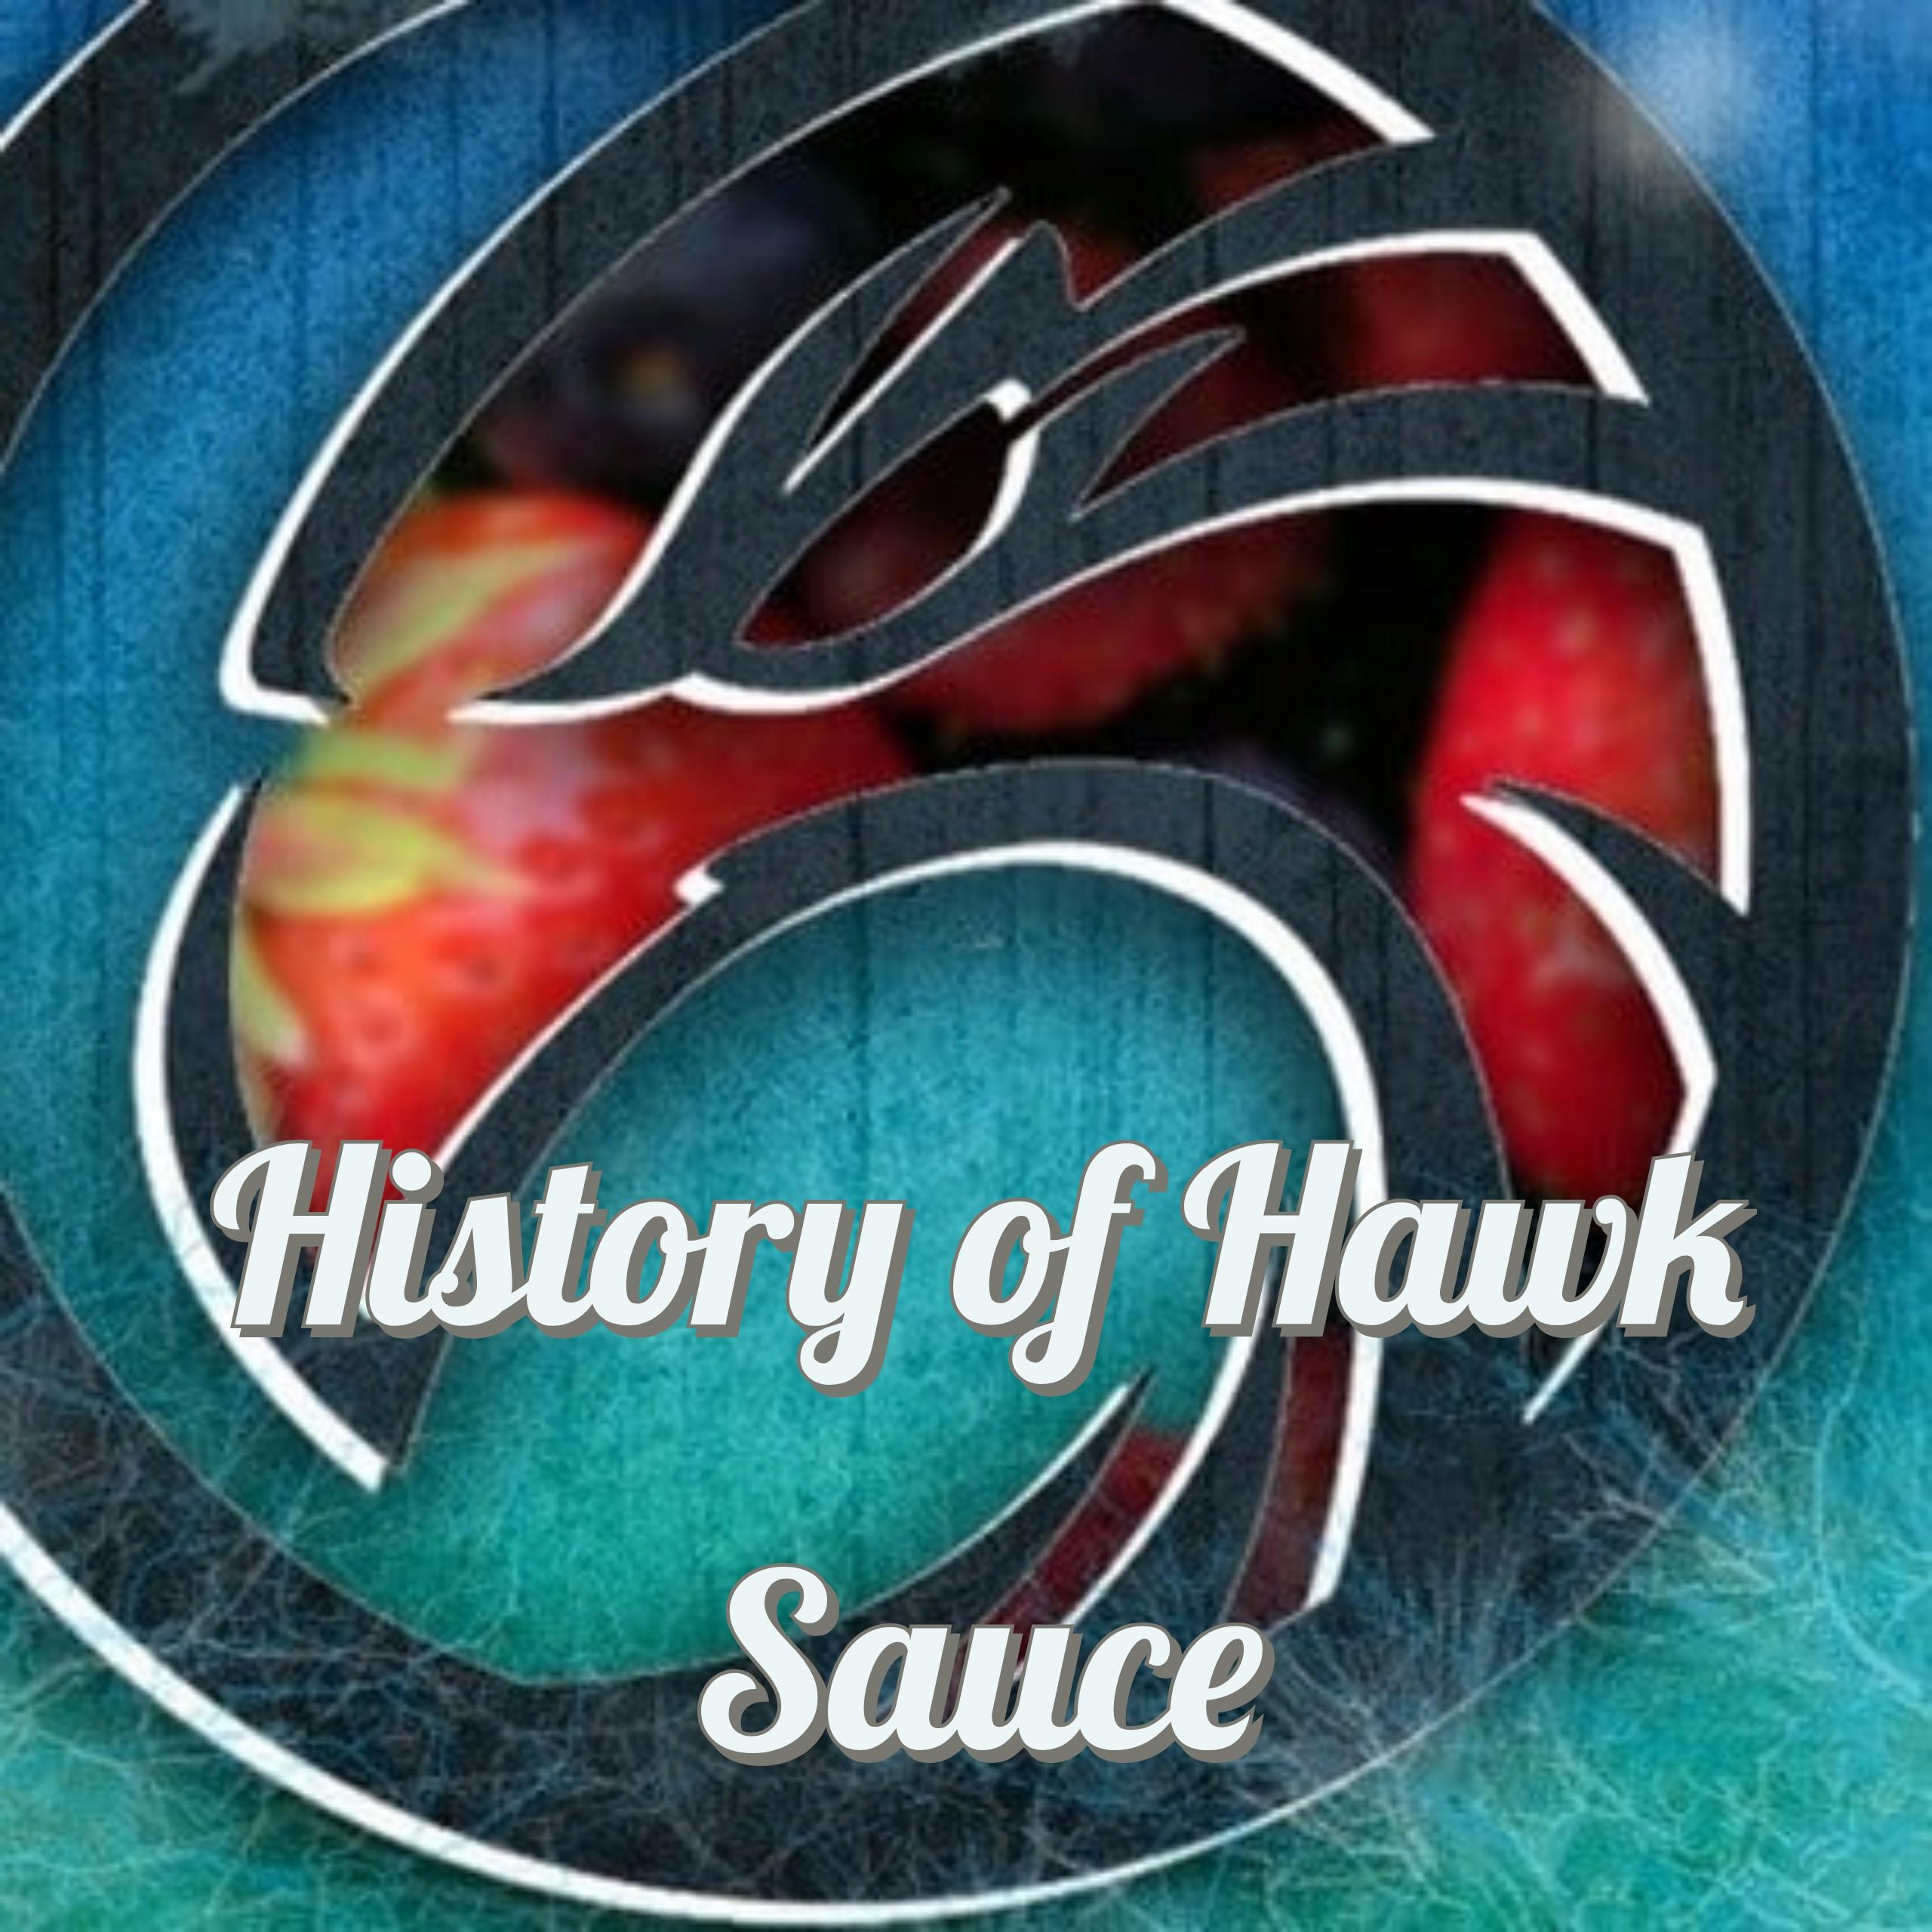 History of Hawk Sauce